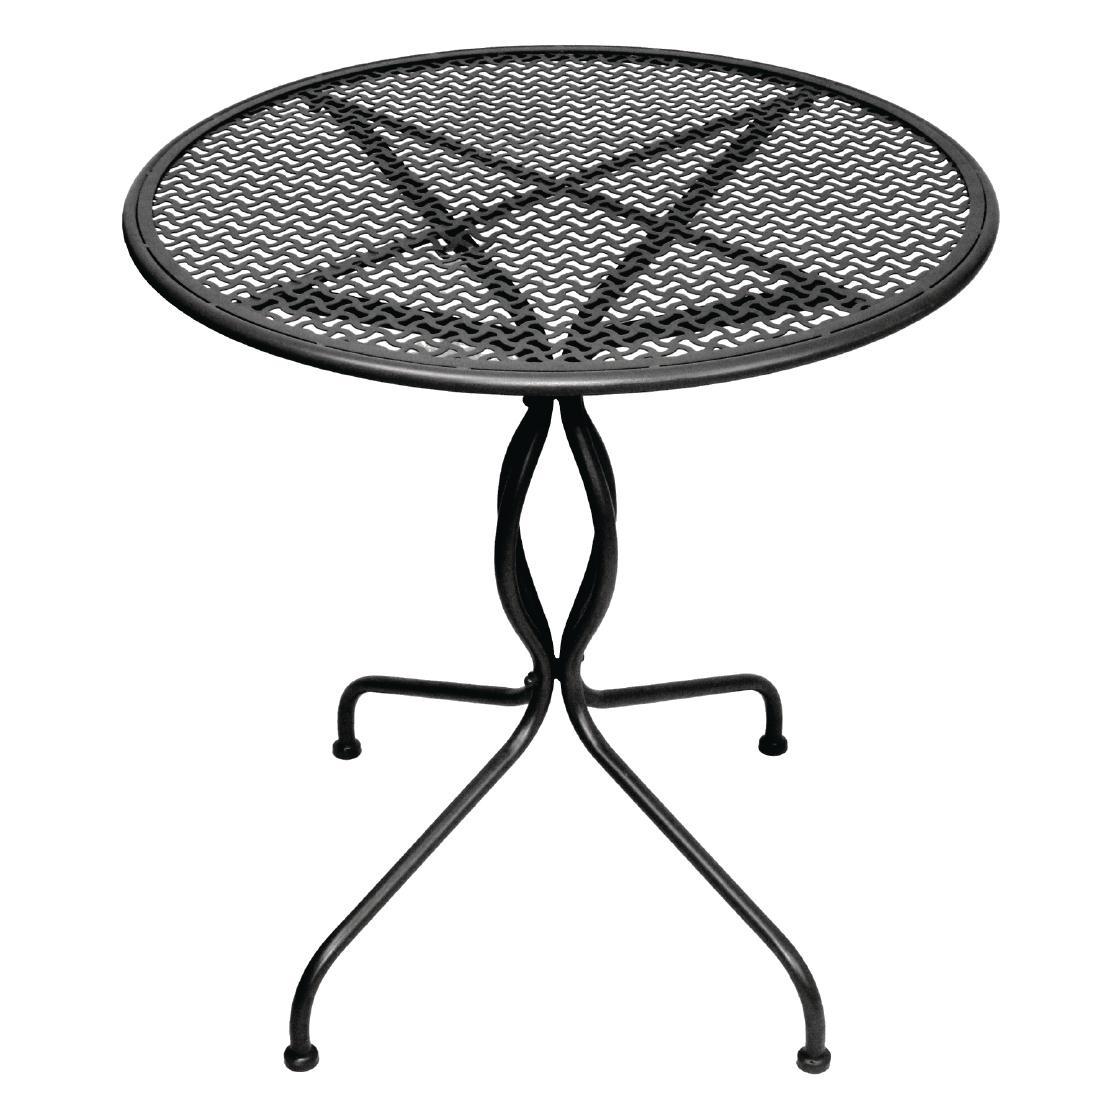 Table de patio classique en acier noire 700mm